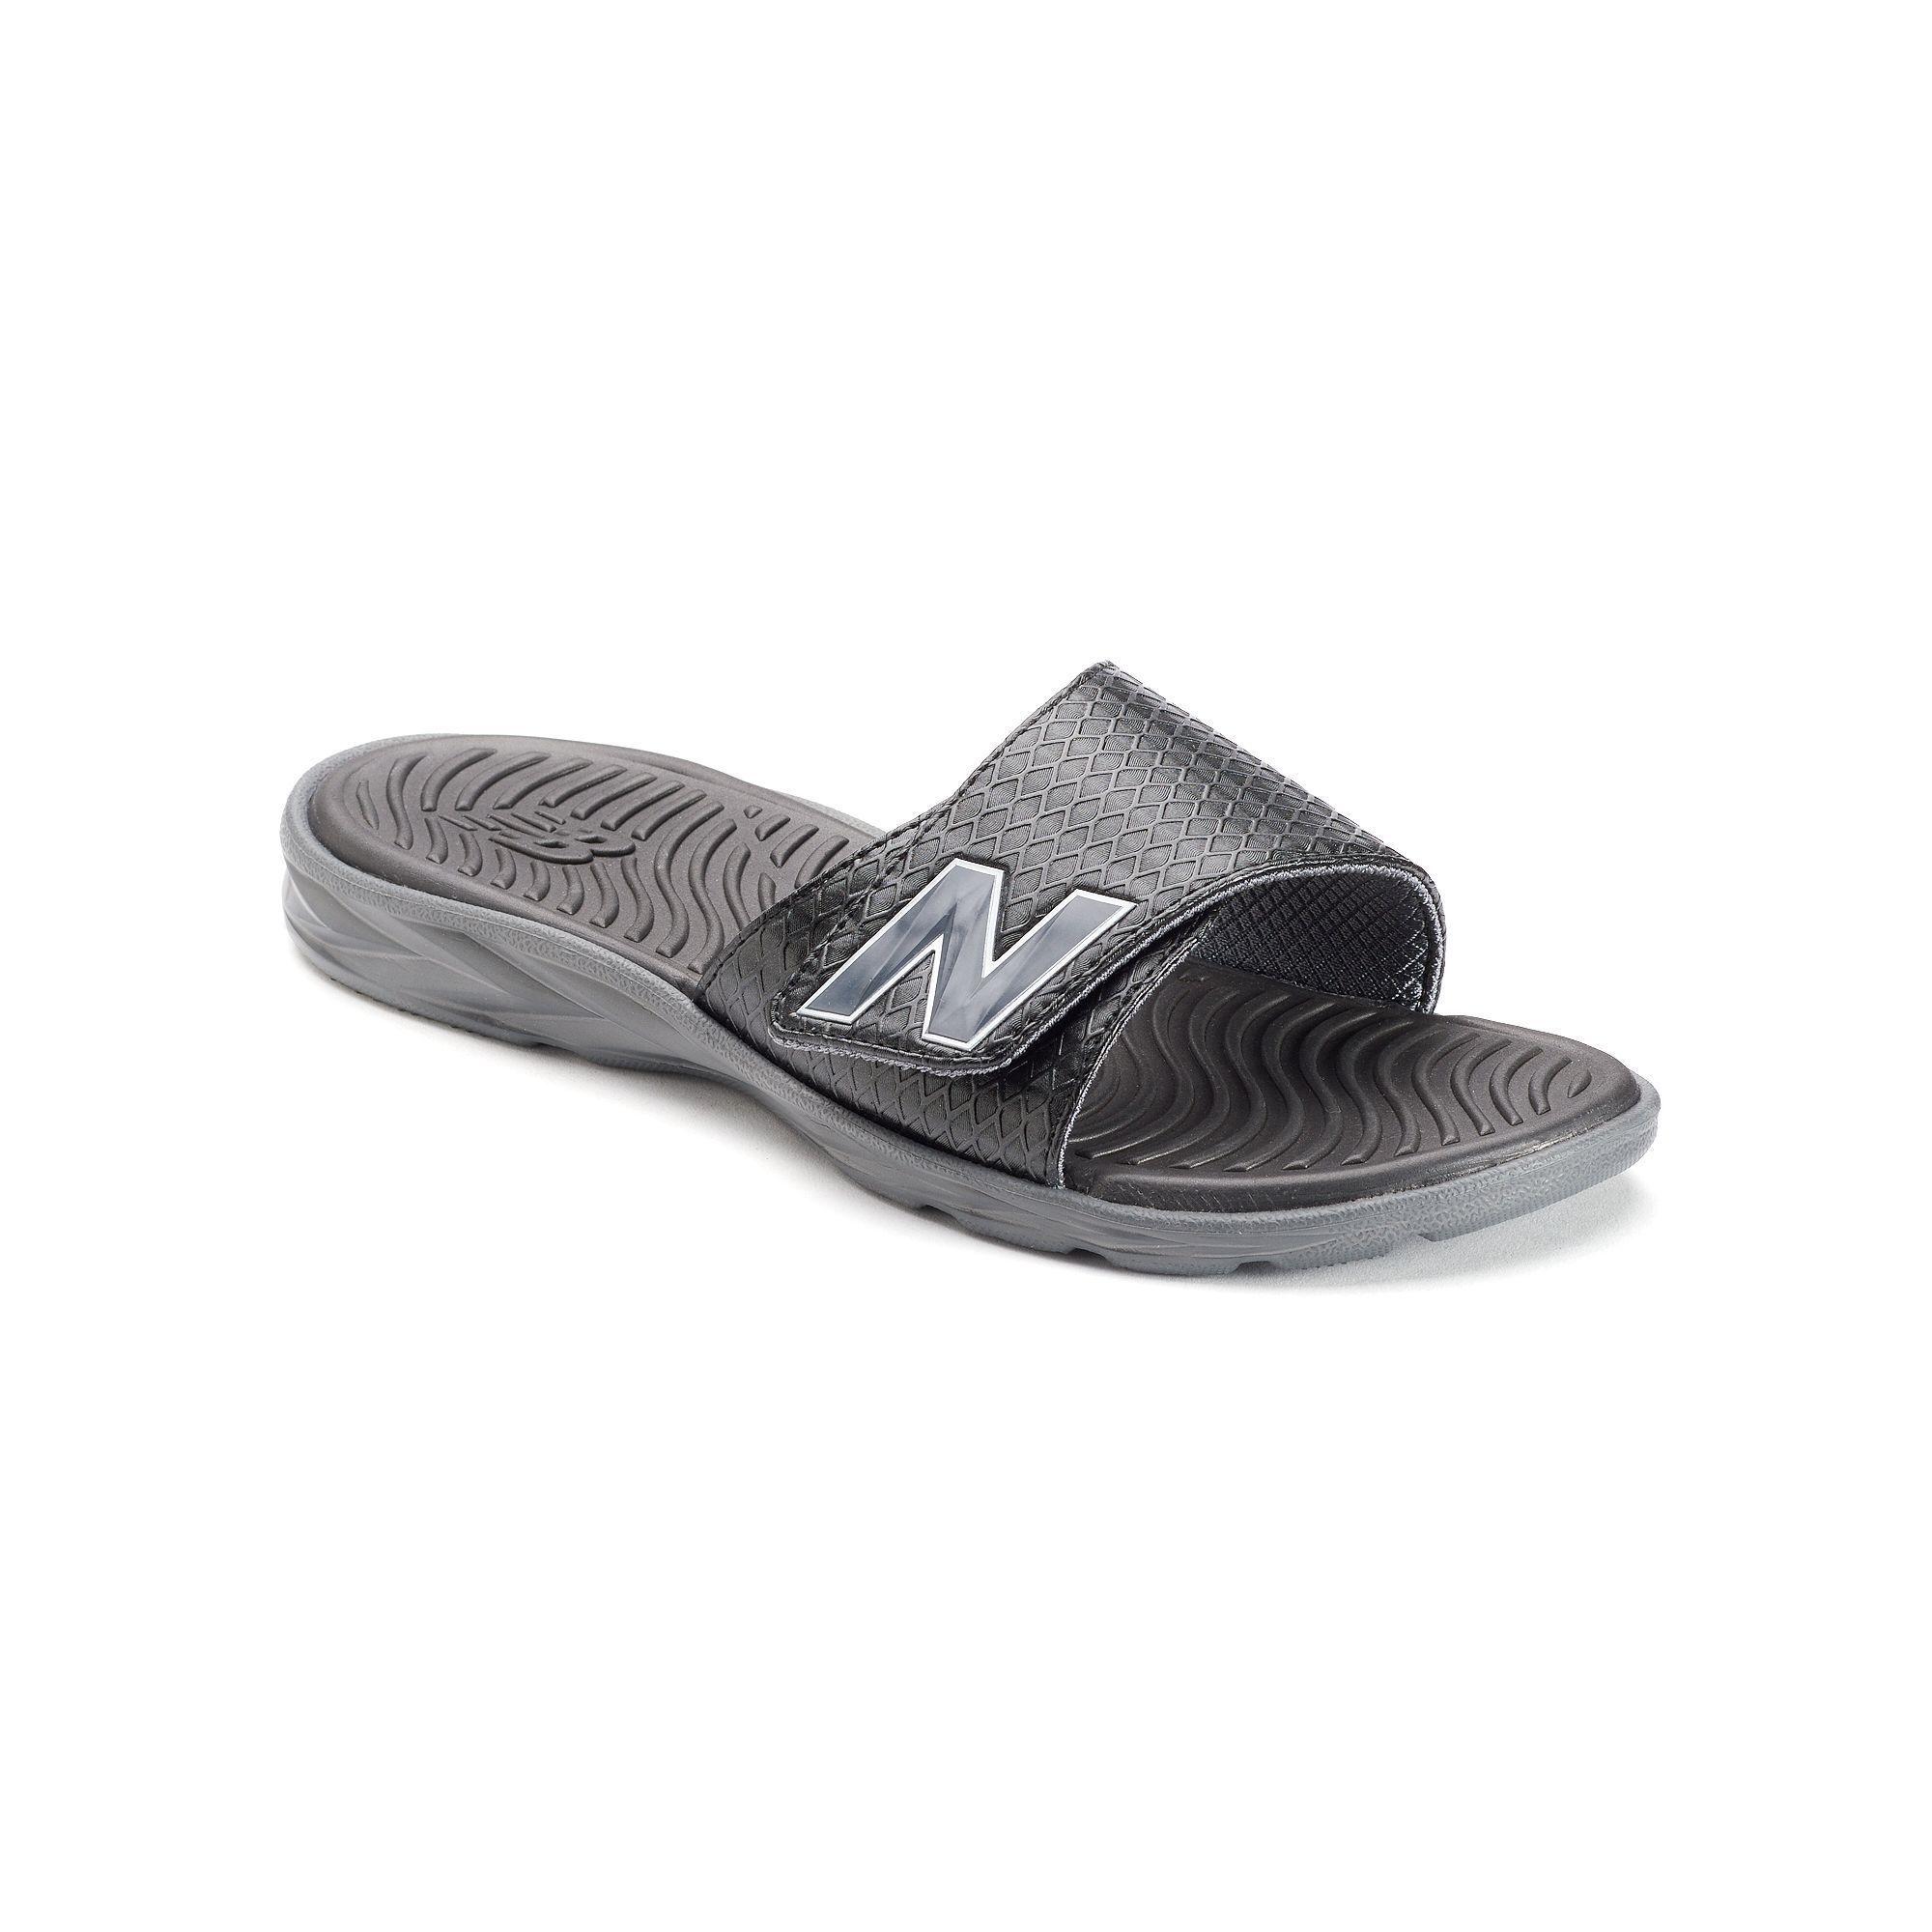 5520d5a1eb4 New Balance Response Men s Slide Sandals